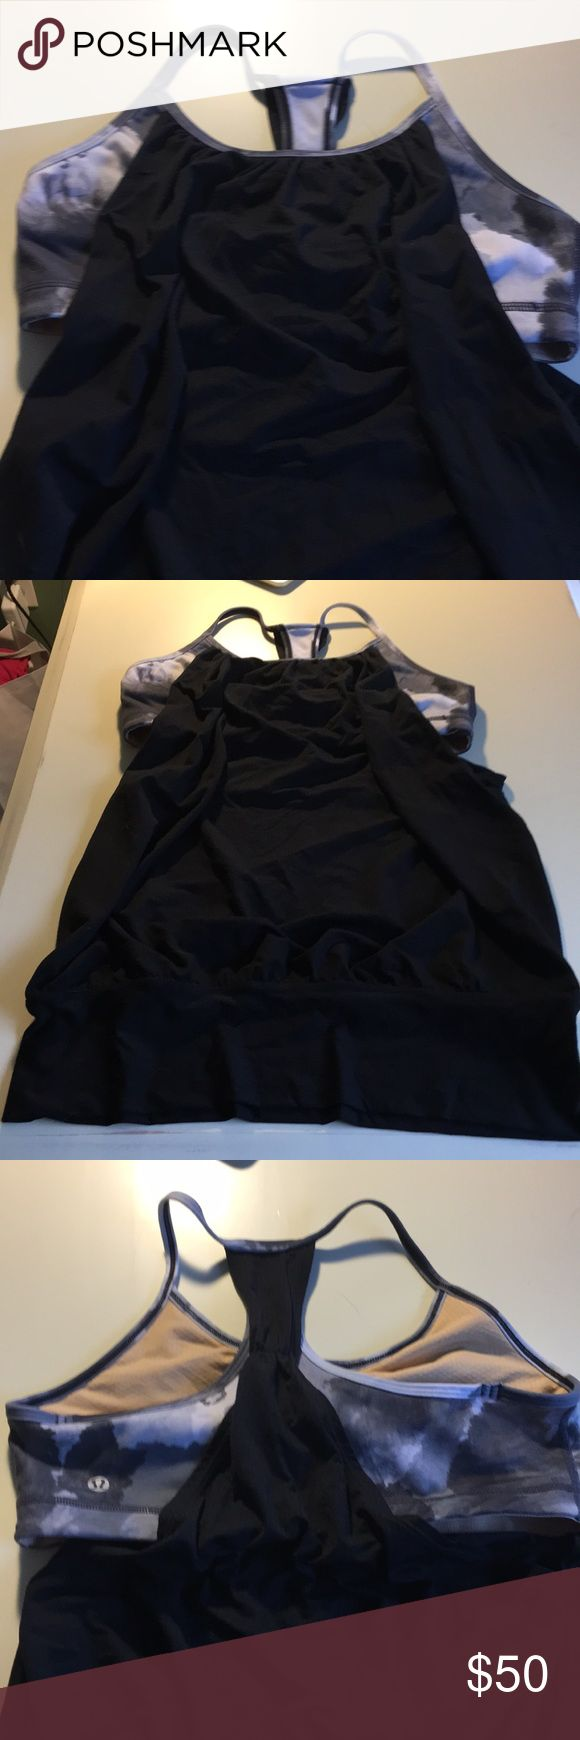 Lululemon support bra mesh tank Black mesh lululemon tank with fun black, white bra. Worn once size 8. lululemon athletica Tops Tank Tops